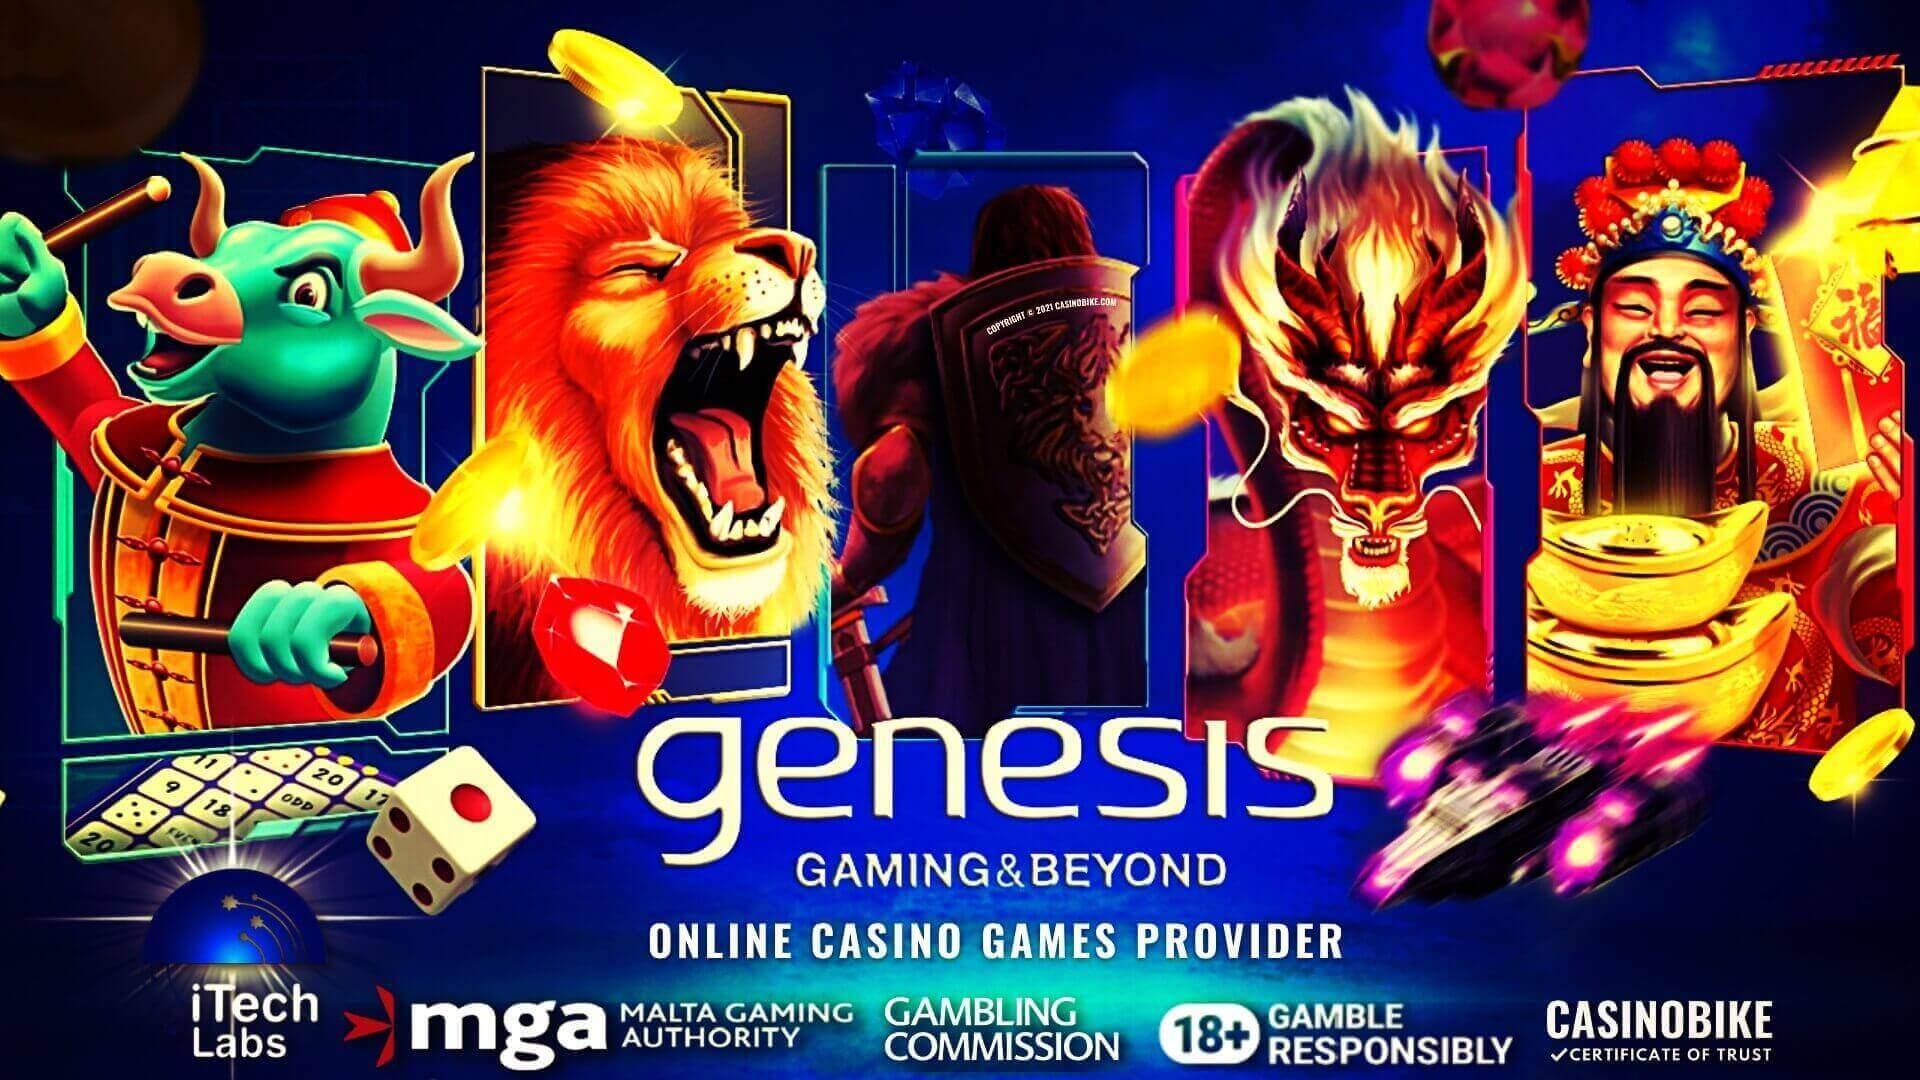 Genesis Gaming Online Casino Games Provider